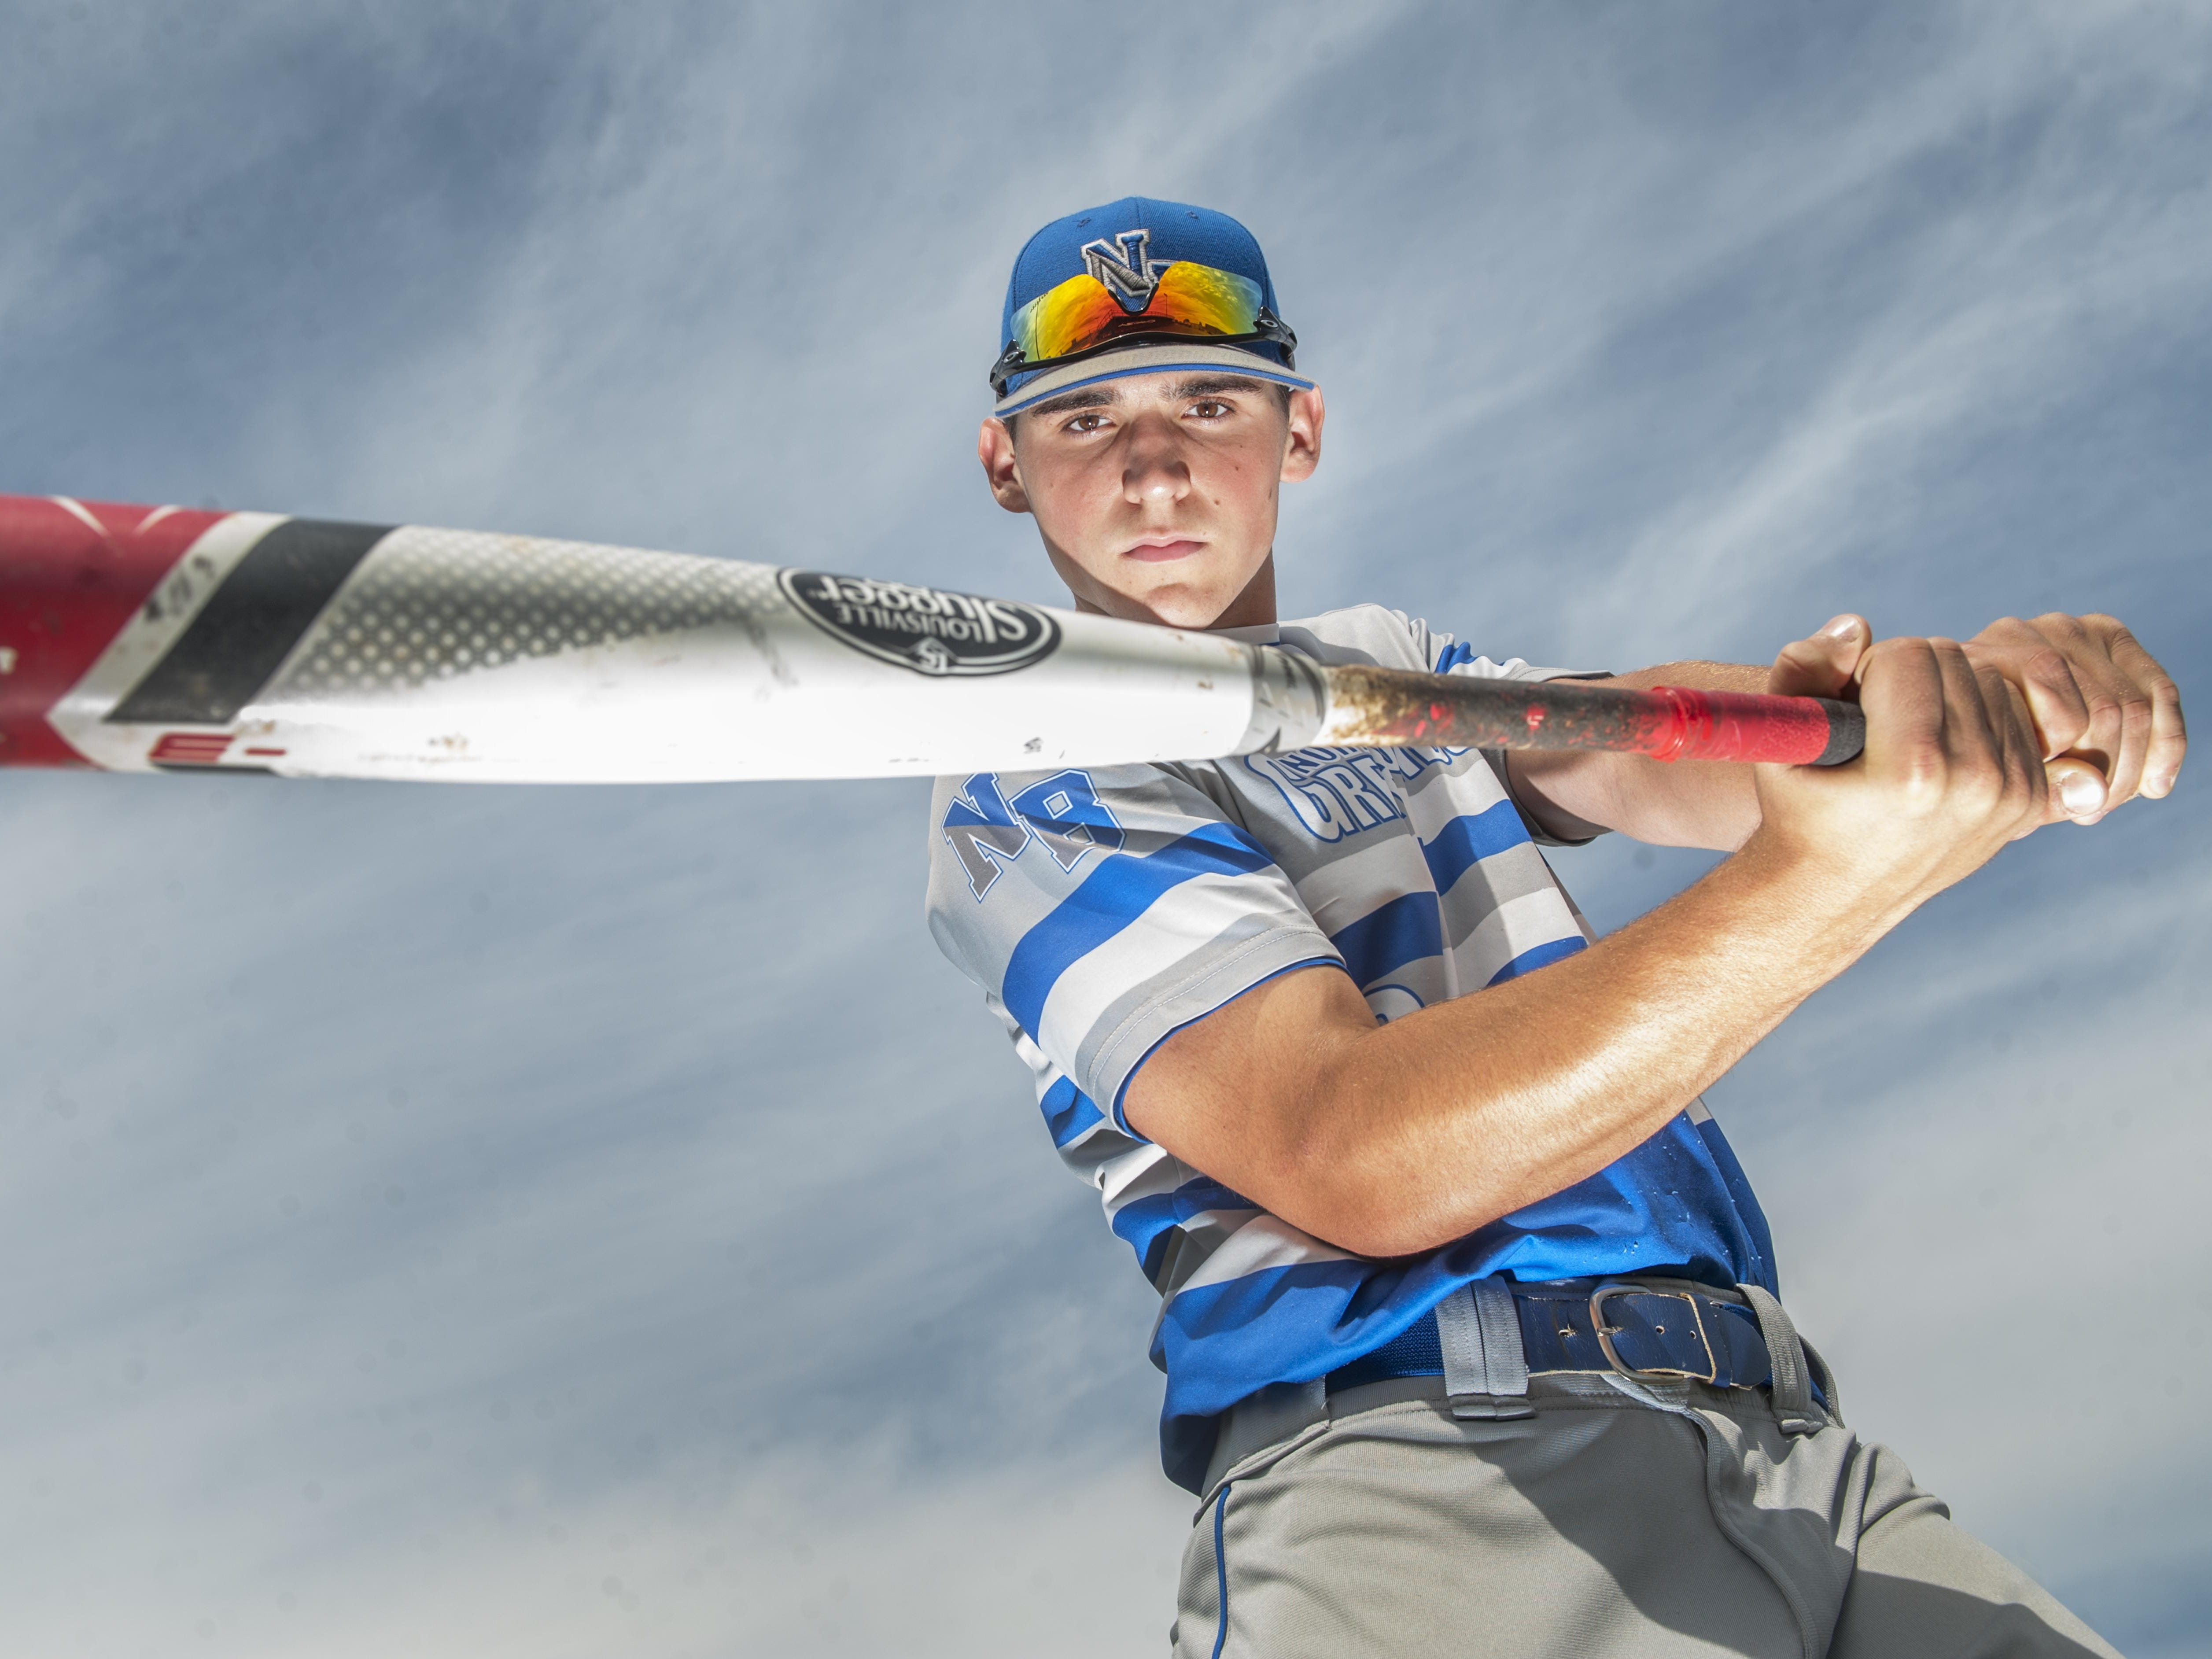 Baseball Player of the Year - Ryan Shinn of Northern Burlington High School. 06.17.15